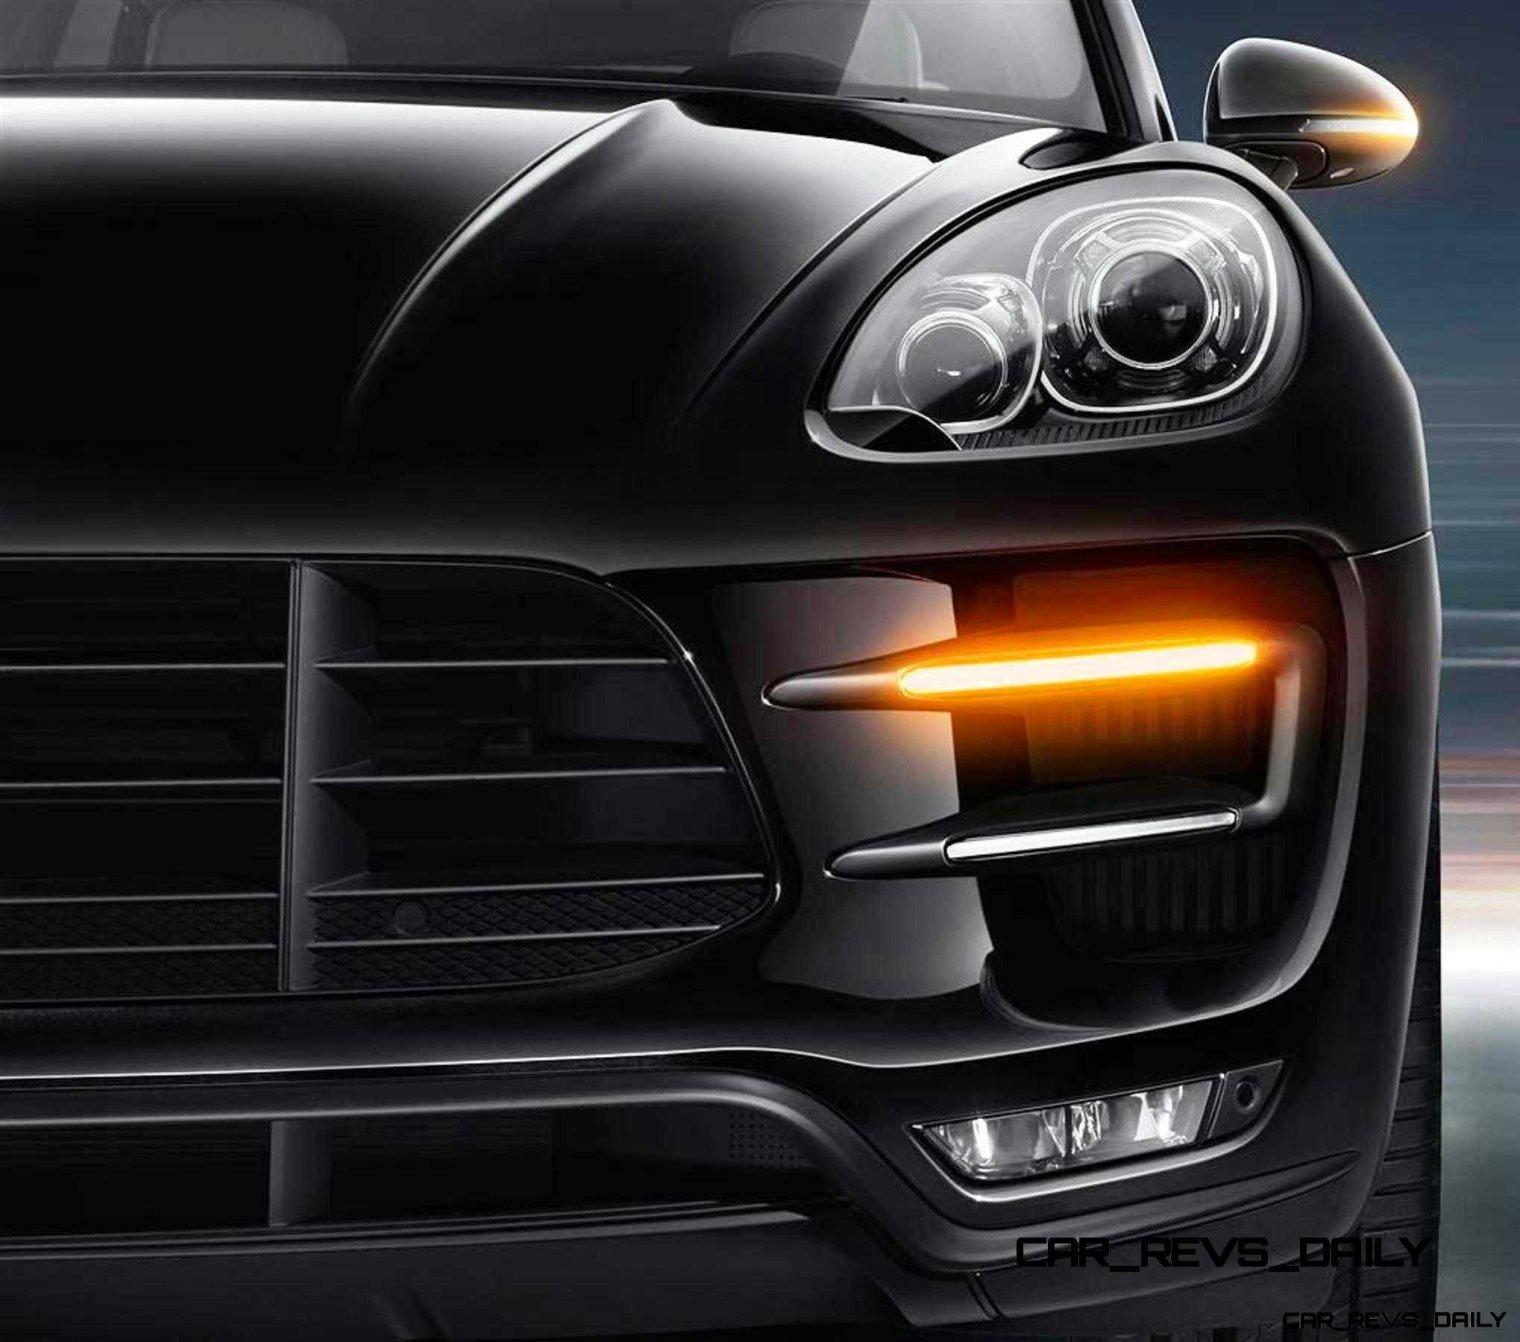 2015 Porsche Macan - Latest Images - CarRevsDaily.com 74